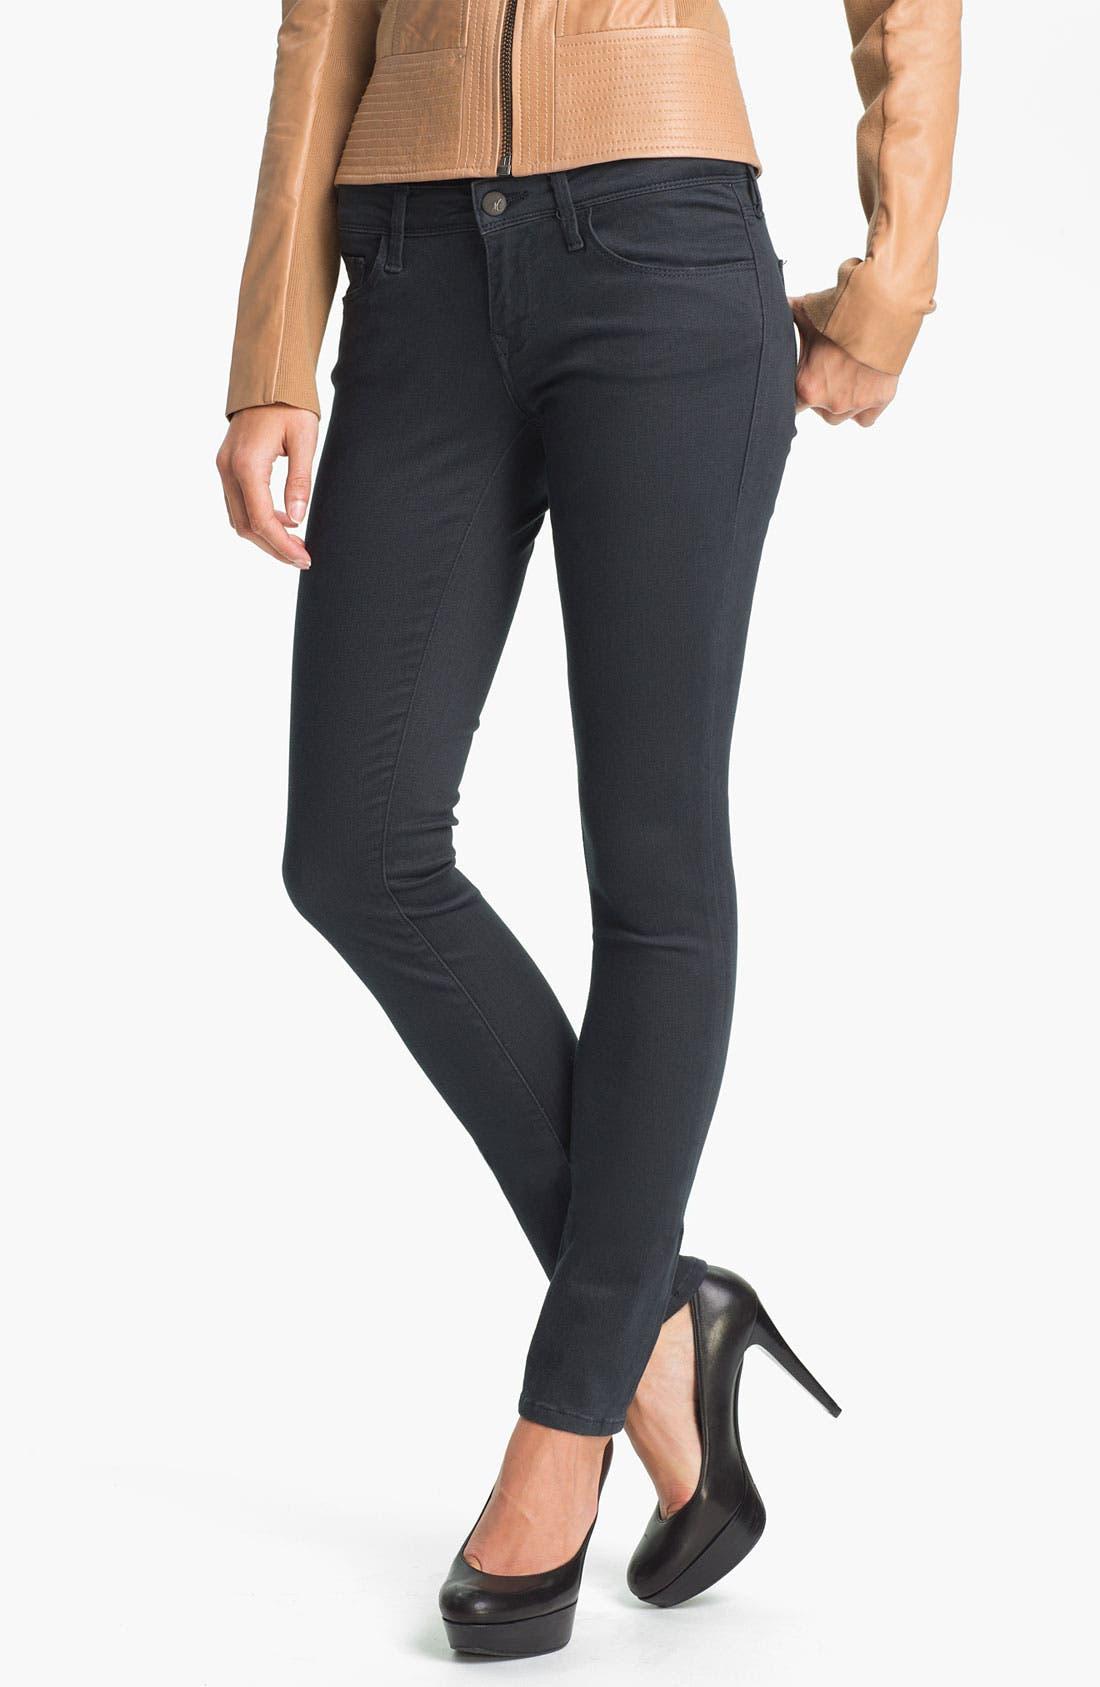 Main Image - Mavi Jeans 'Serena' Low Rise Skinny  Jeans (Sueded Granite) (Online Exclusive)